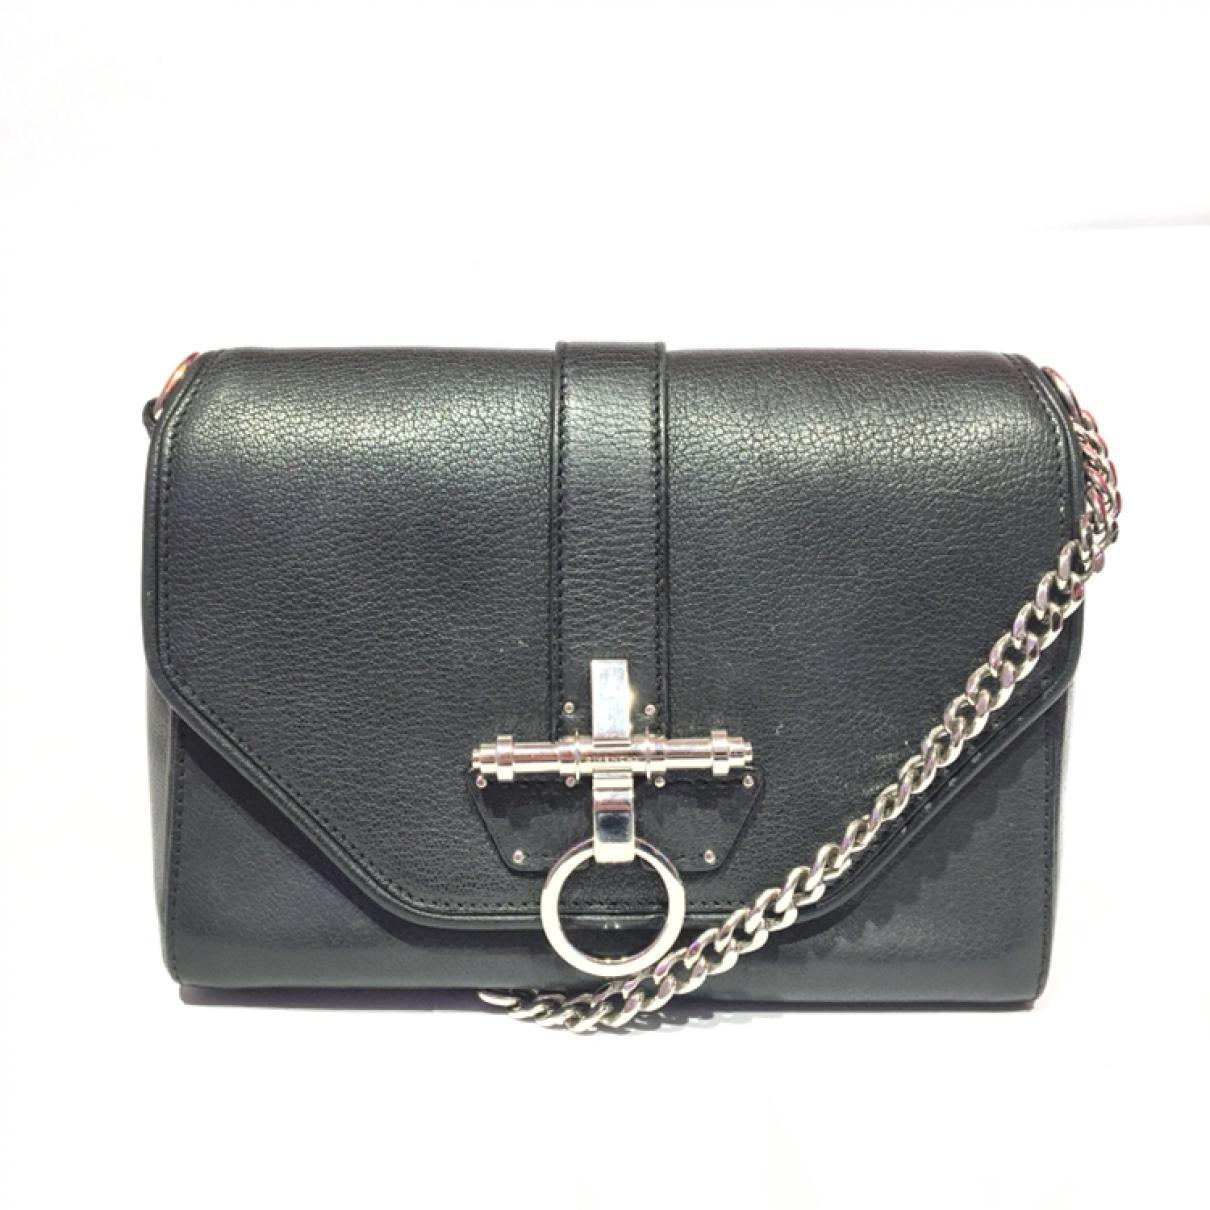 In Givenchy Black Lyst Leather Handbag Obsedia xeWrBodC